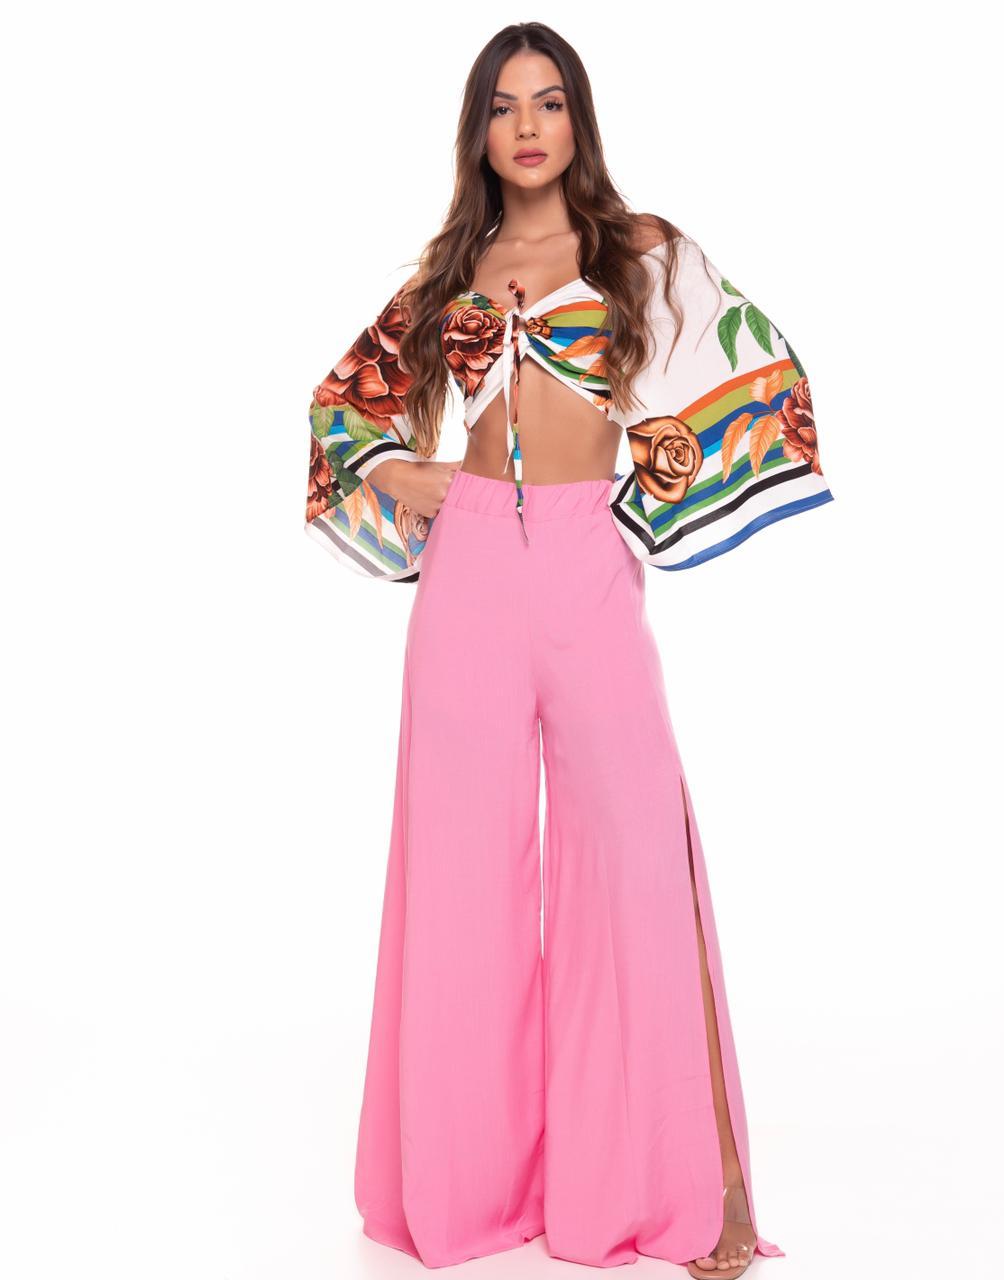 Calça Viscose Luxo Pantalona LDO 79 - Cor: Rosa Bebê